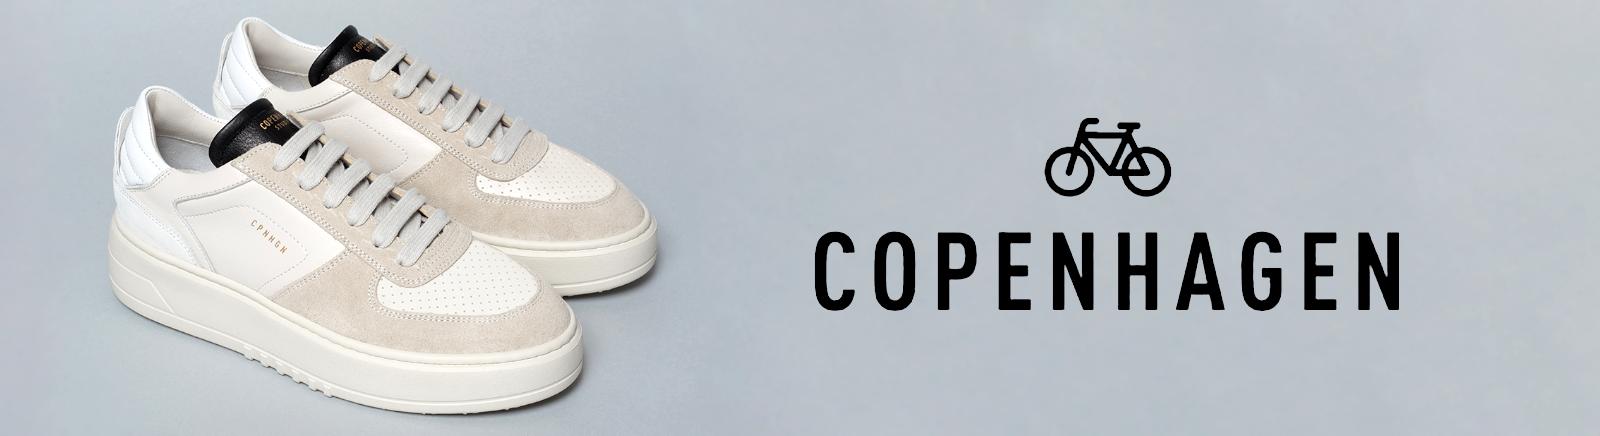 Juppen: Copenhagen Combat Boots für Damen online shoppen